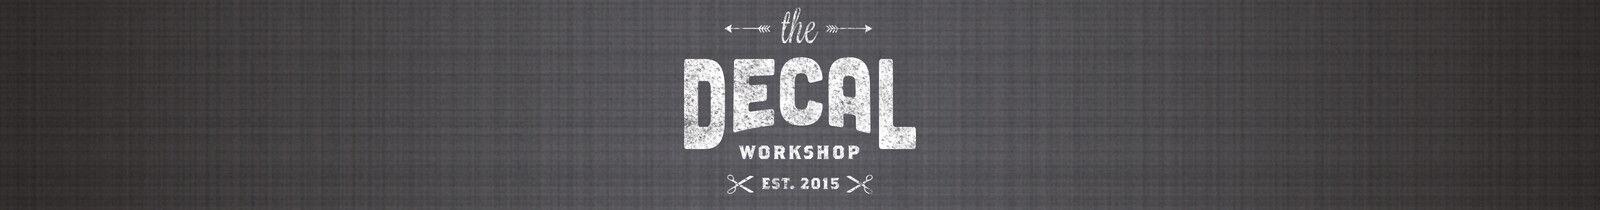 TheDecalWorkshop